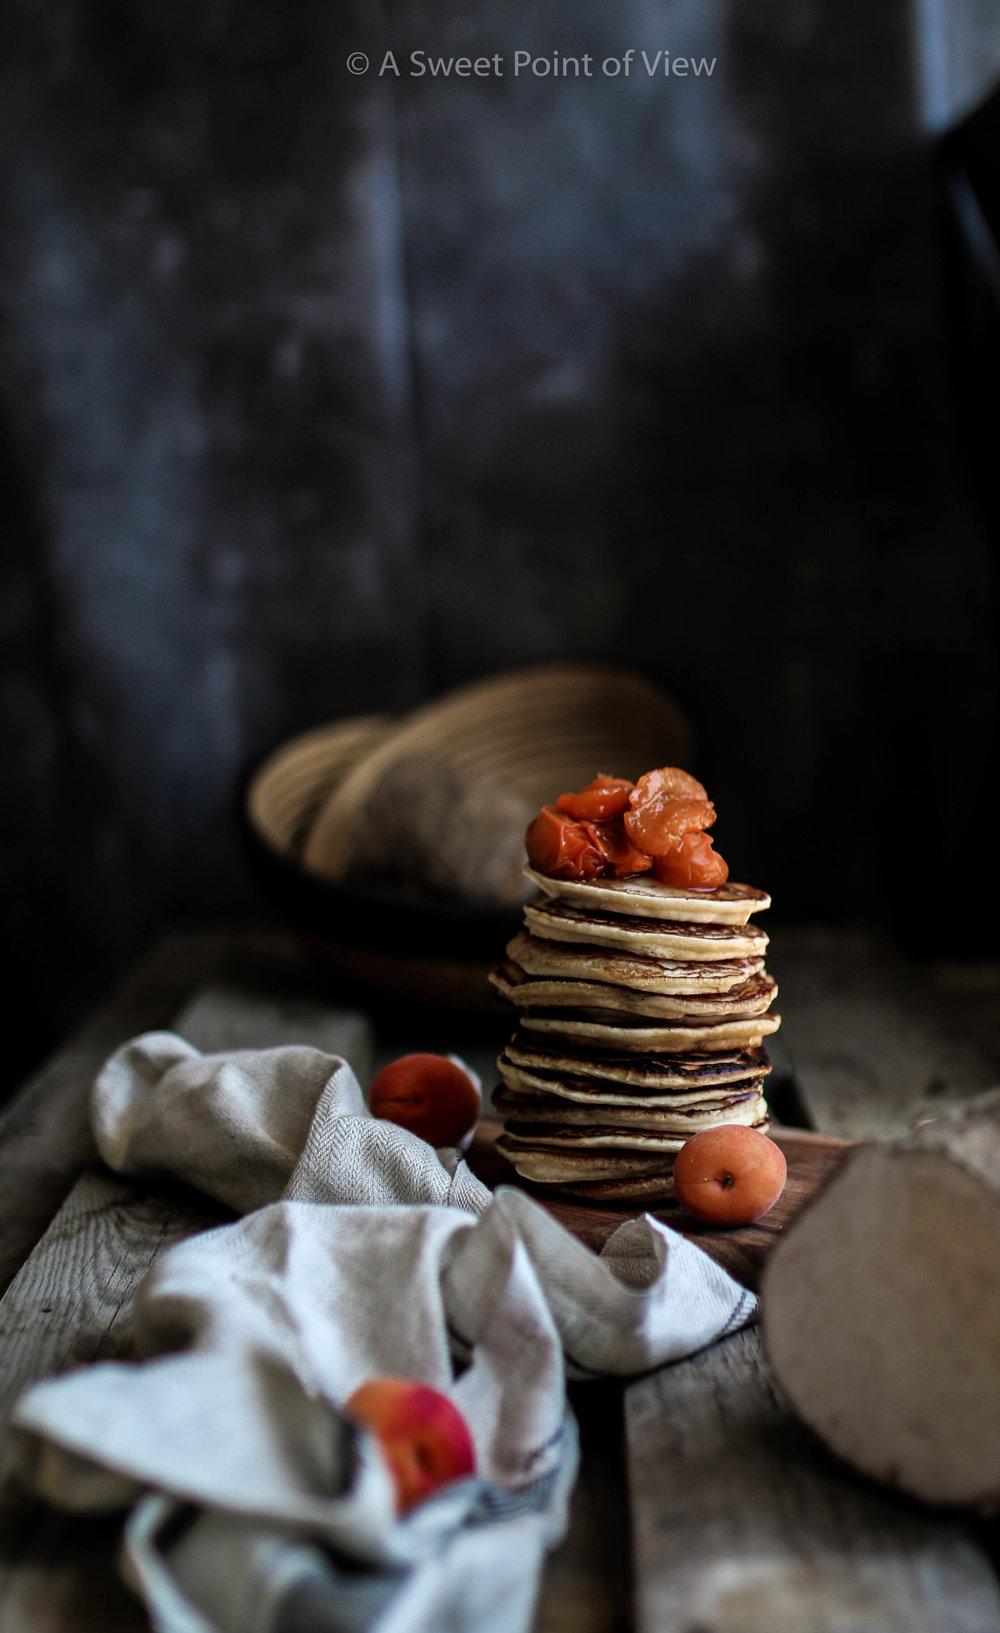 Yam-Flour-Pancakes-Homemade-Apricot-Yam-8-of-1.jpg